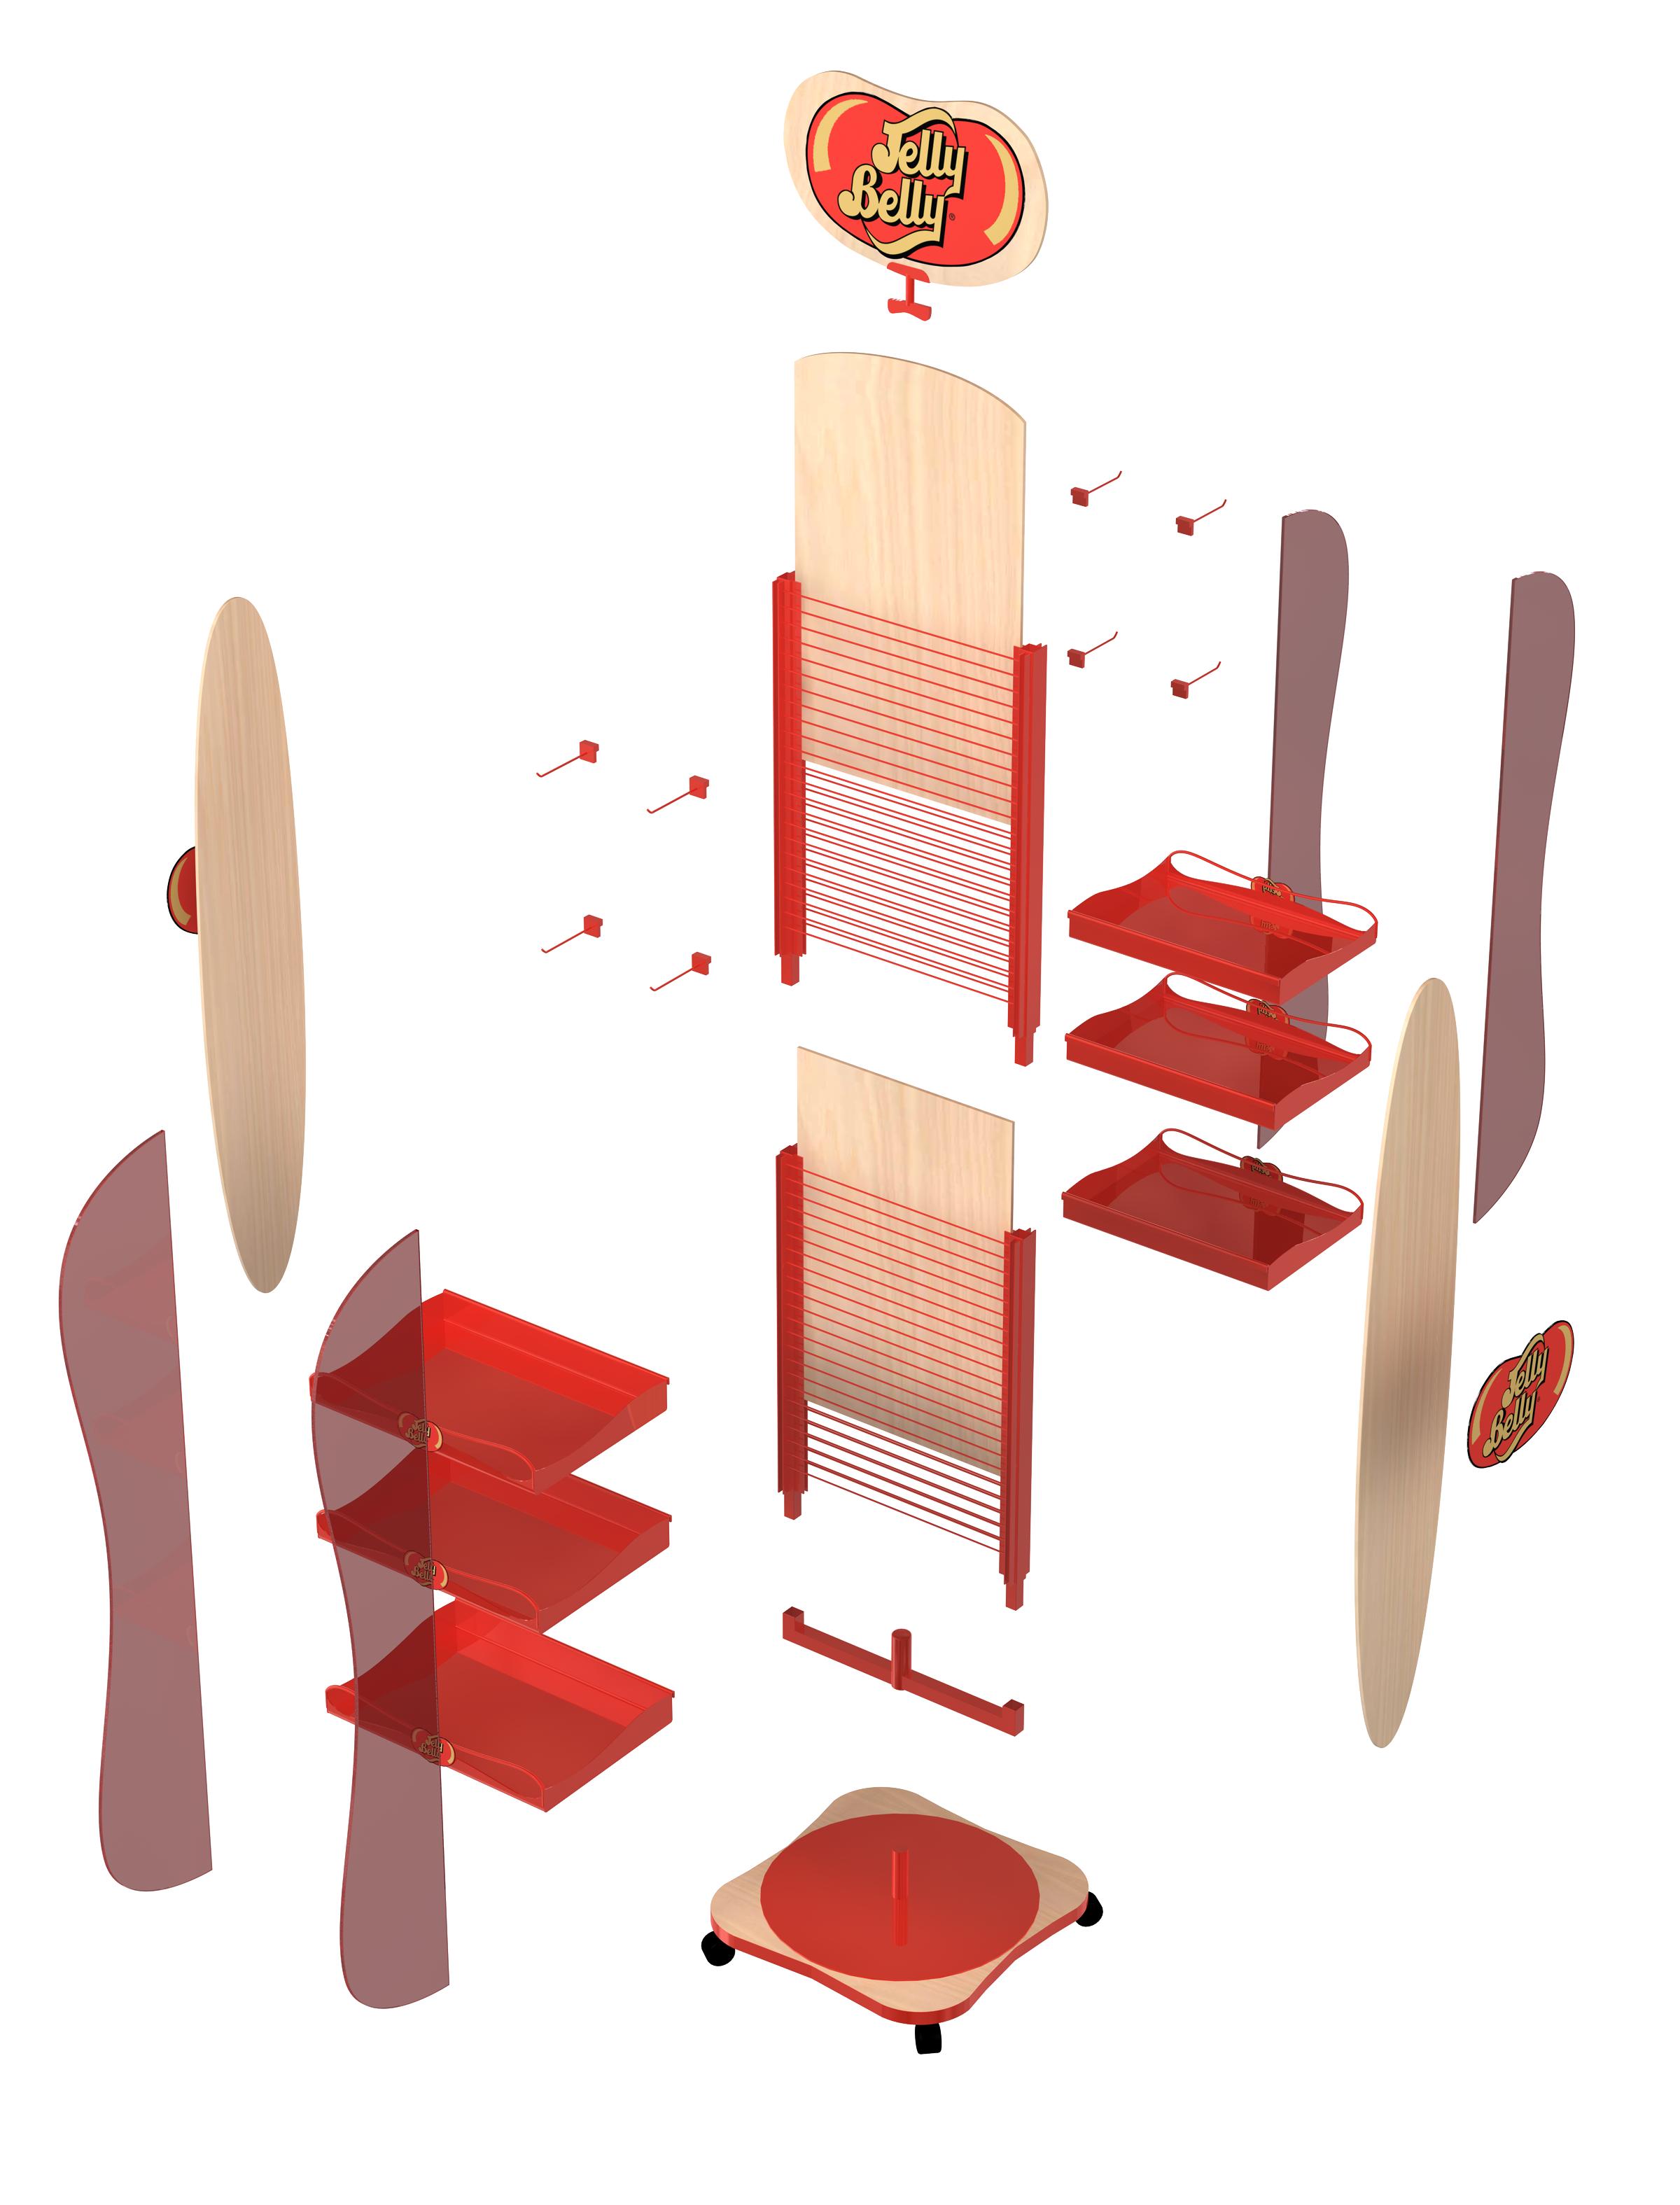 Jelly Belly FloorstandBxp.jpg